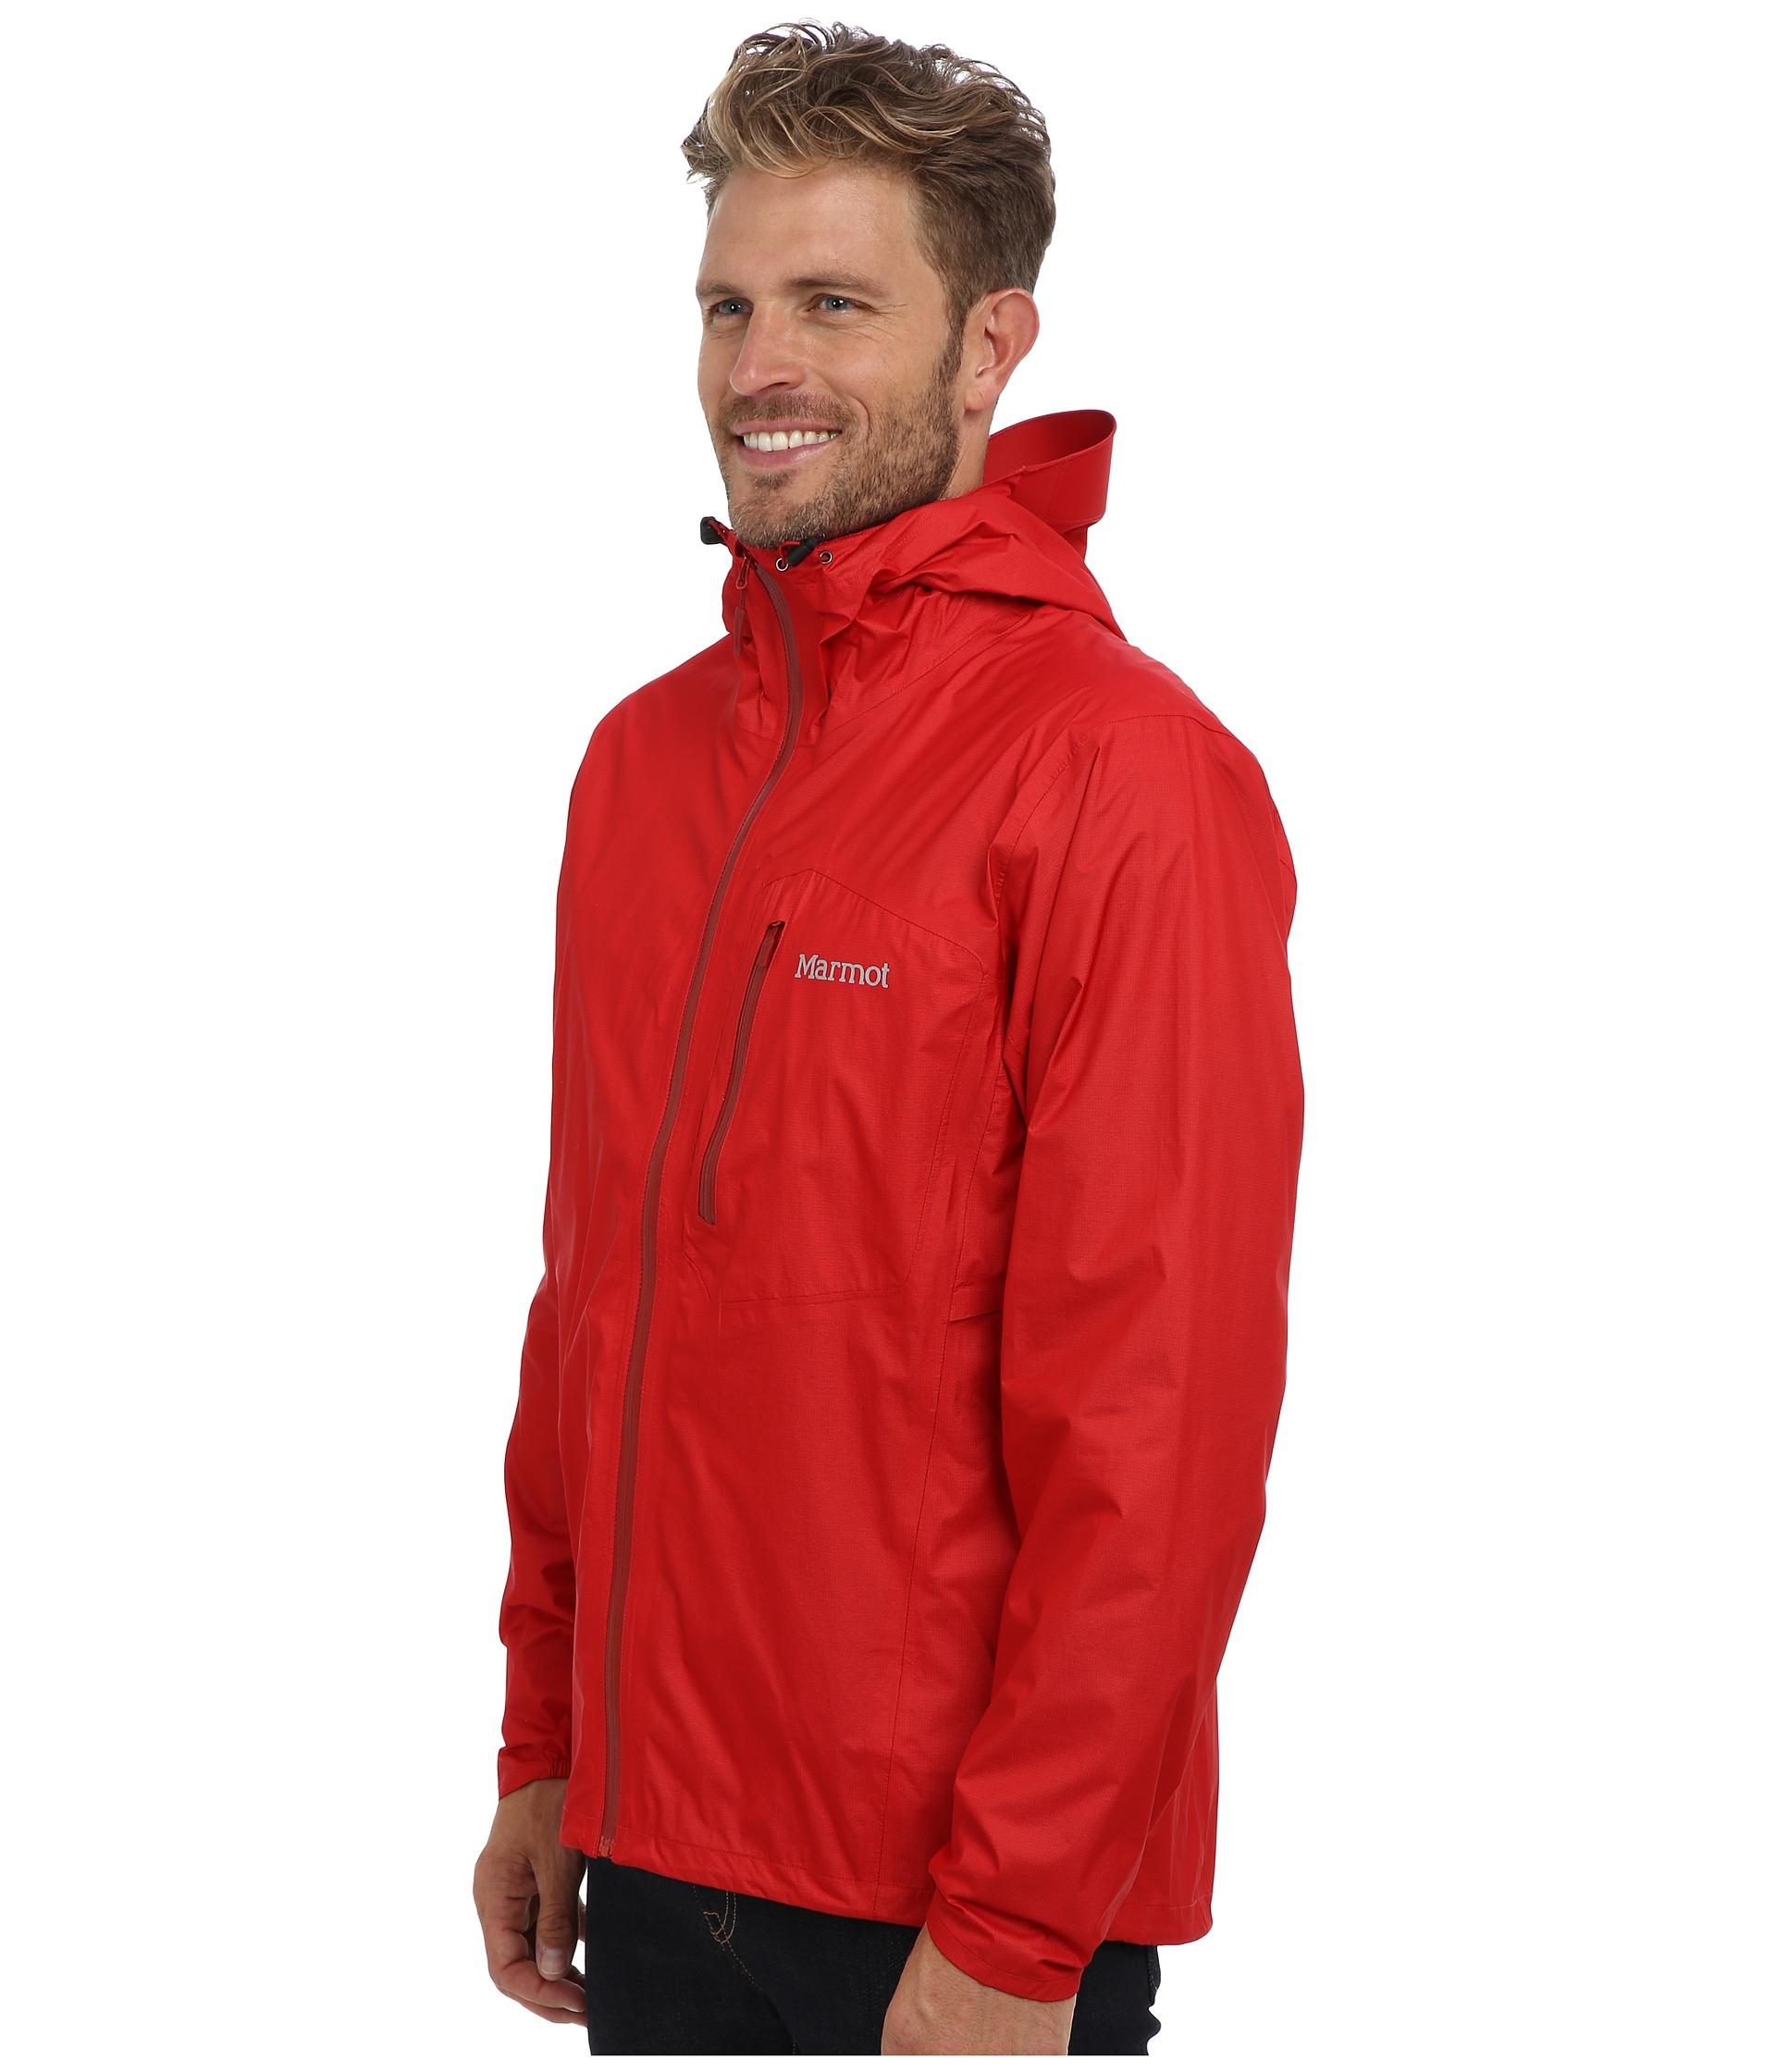 Lyst Marmot Essence Jacket In Red For Men